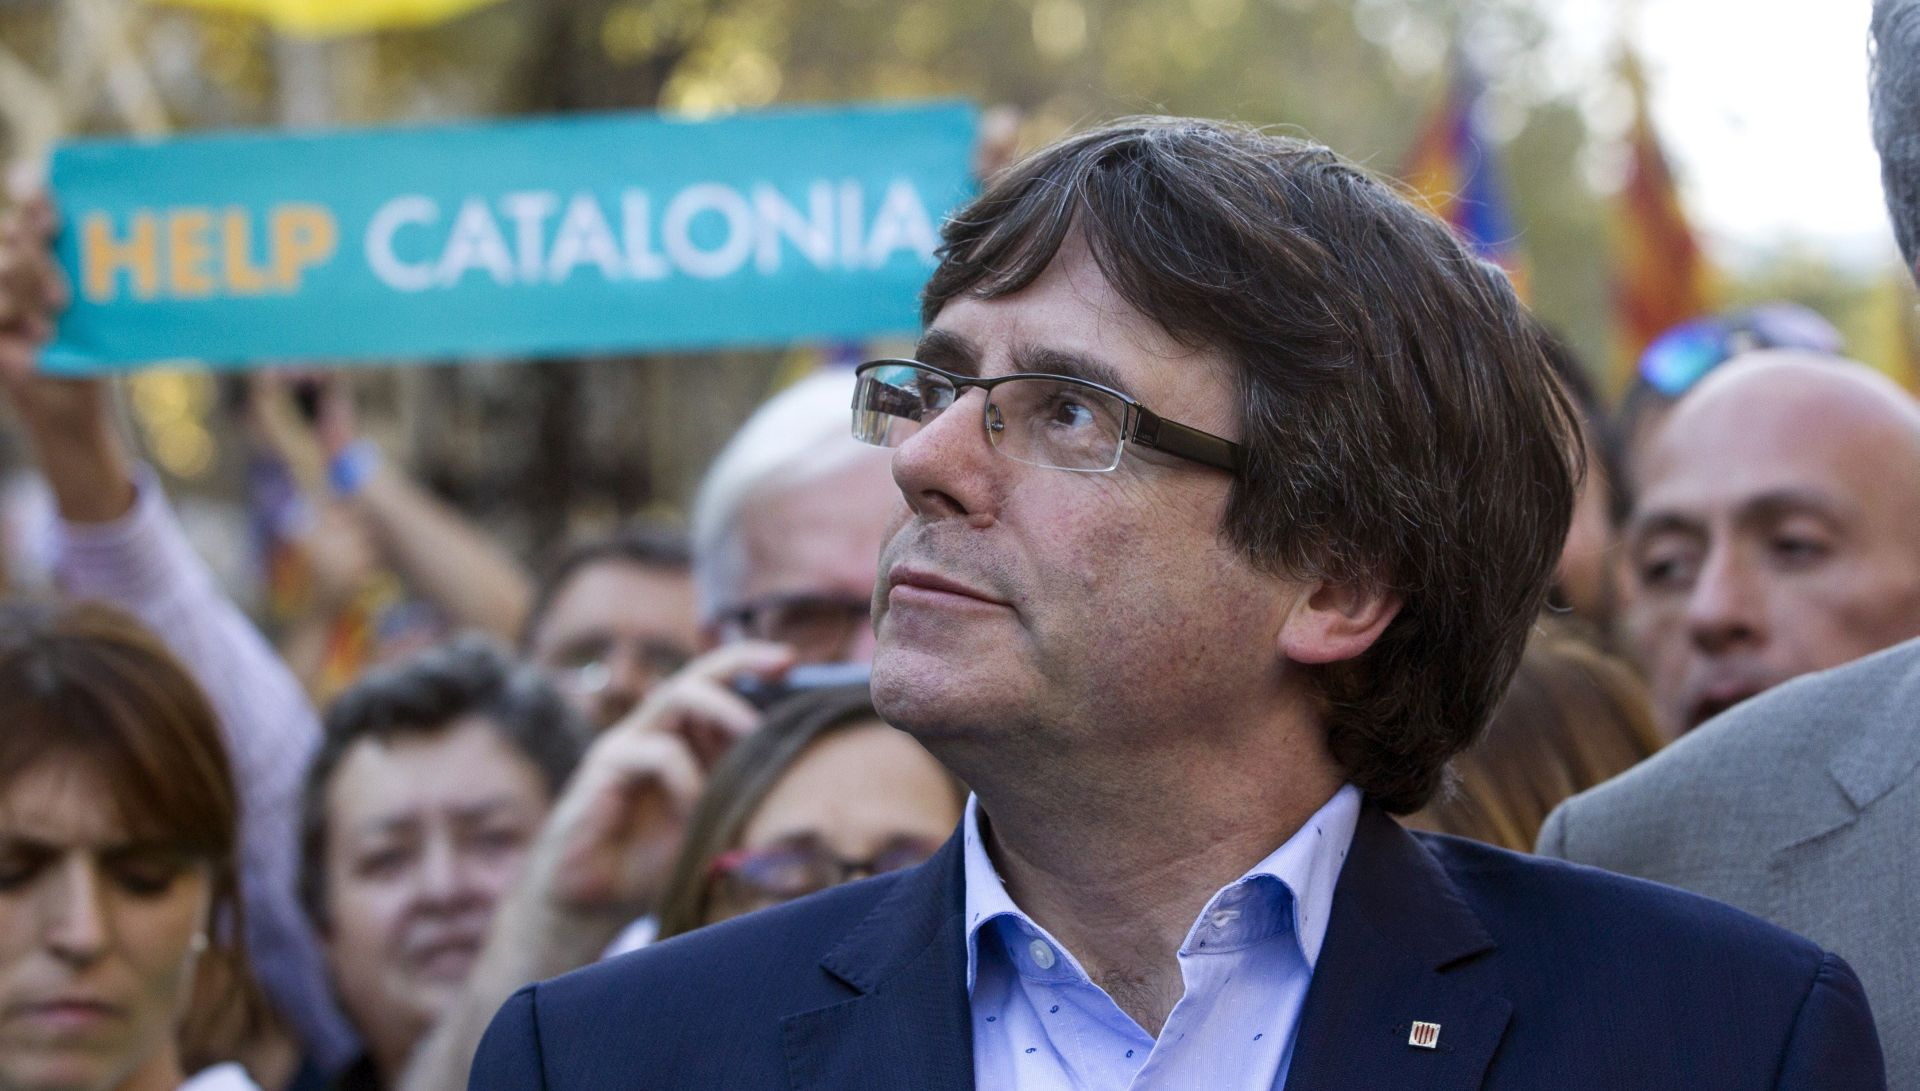 Predsjednica katalonskog parlamenta i Carles Puigdemont žale se ECHR-u